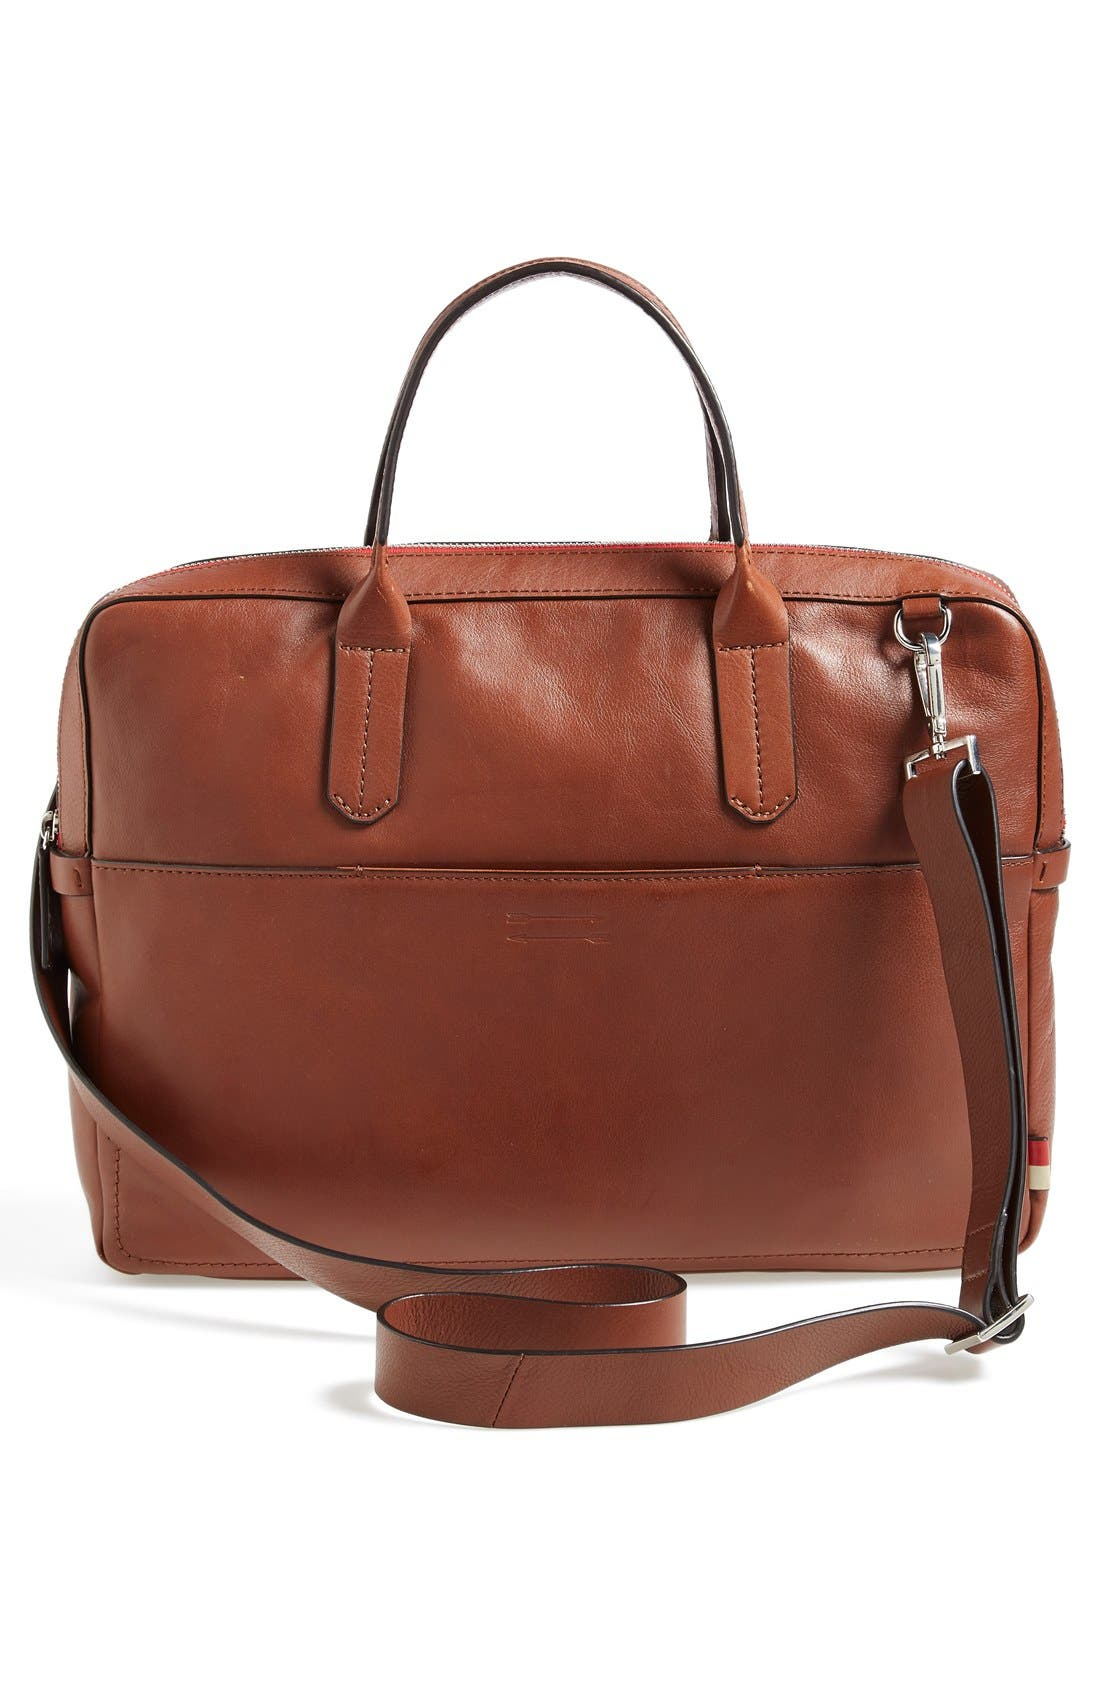 Ben Minkoff 'Fulton' Leather Briefcase,                             Alternate thumbnail 5, color,                             233